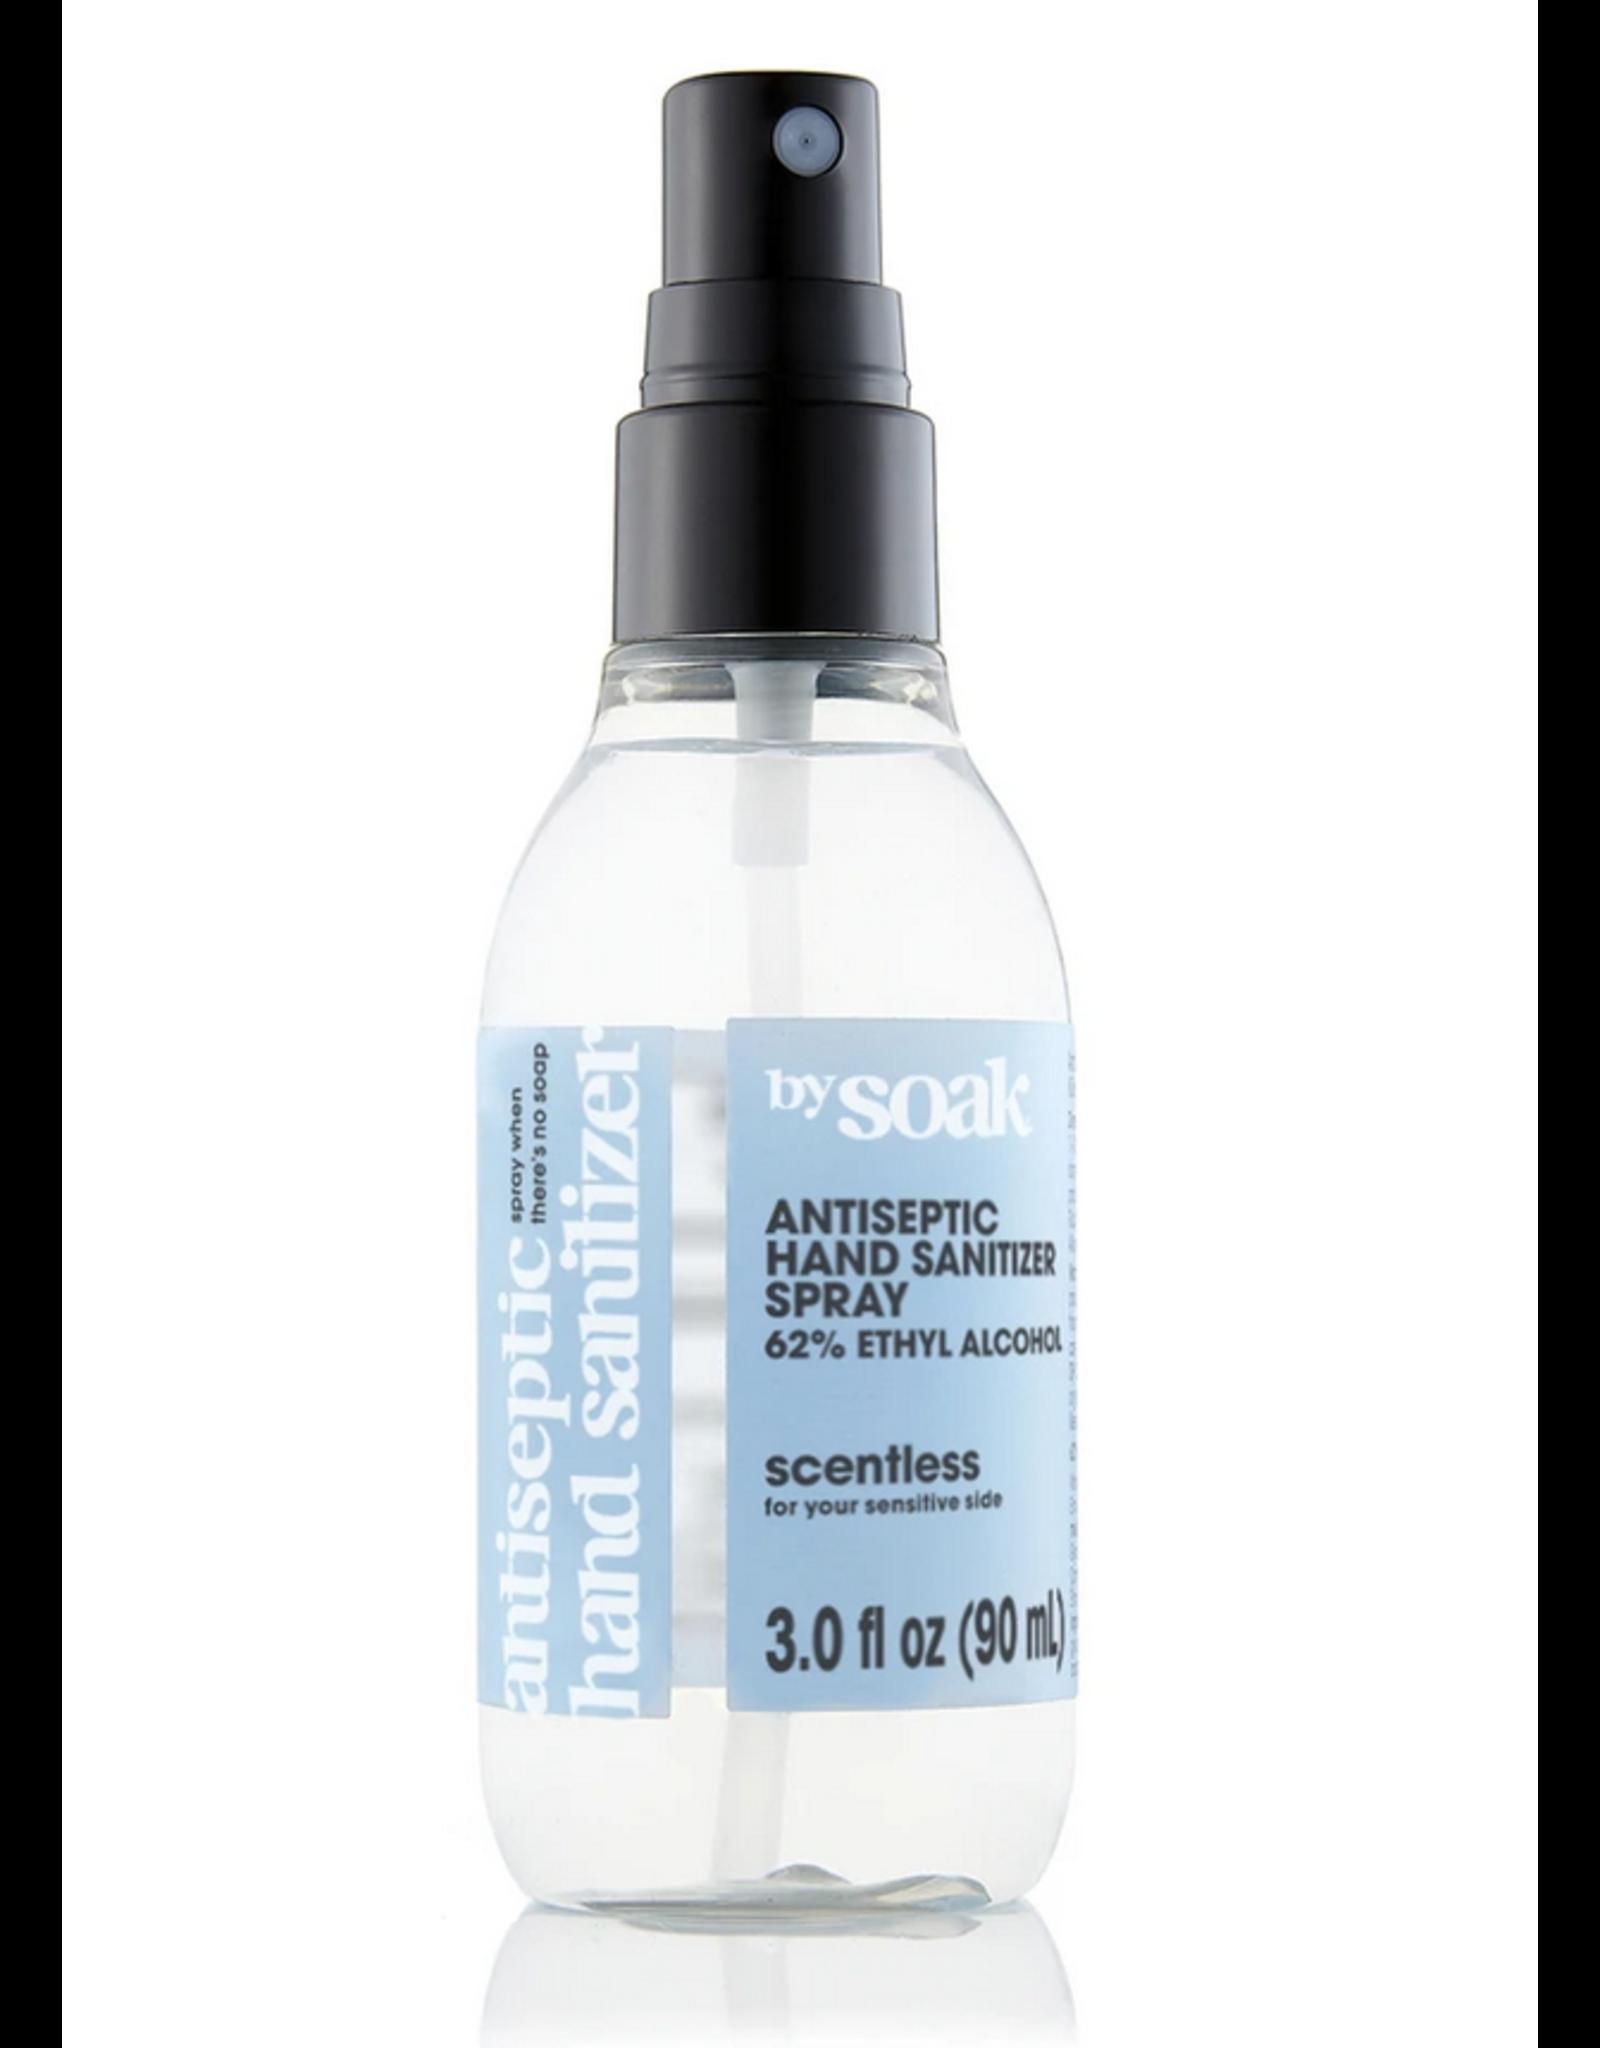 Soak Antiseptic Hand Sanitizer 3oz Scentless